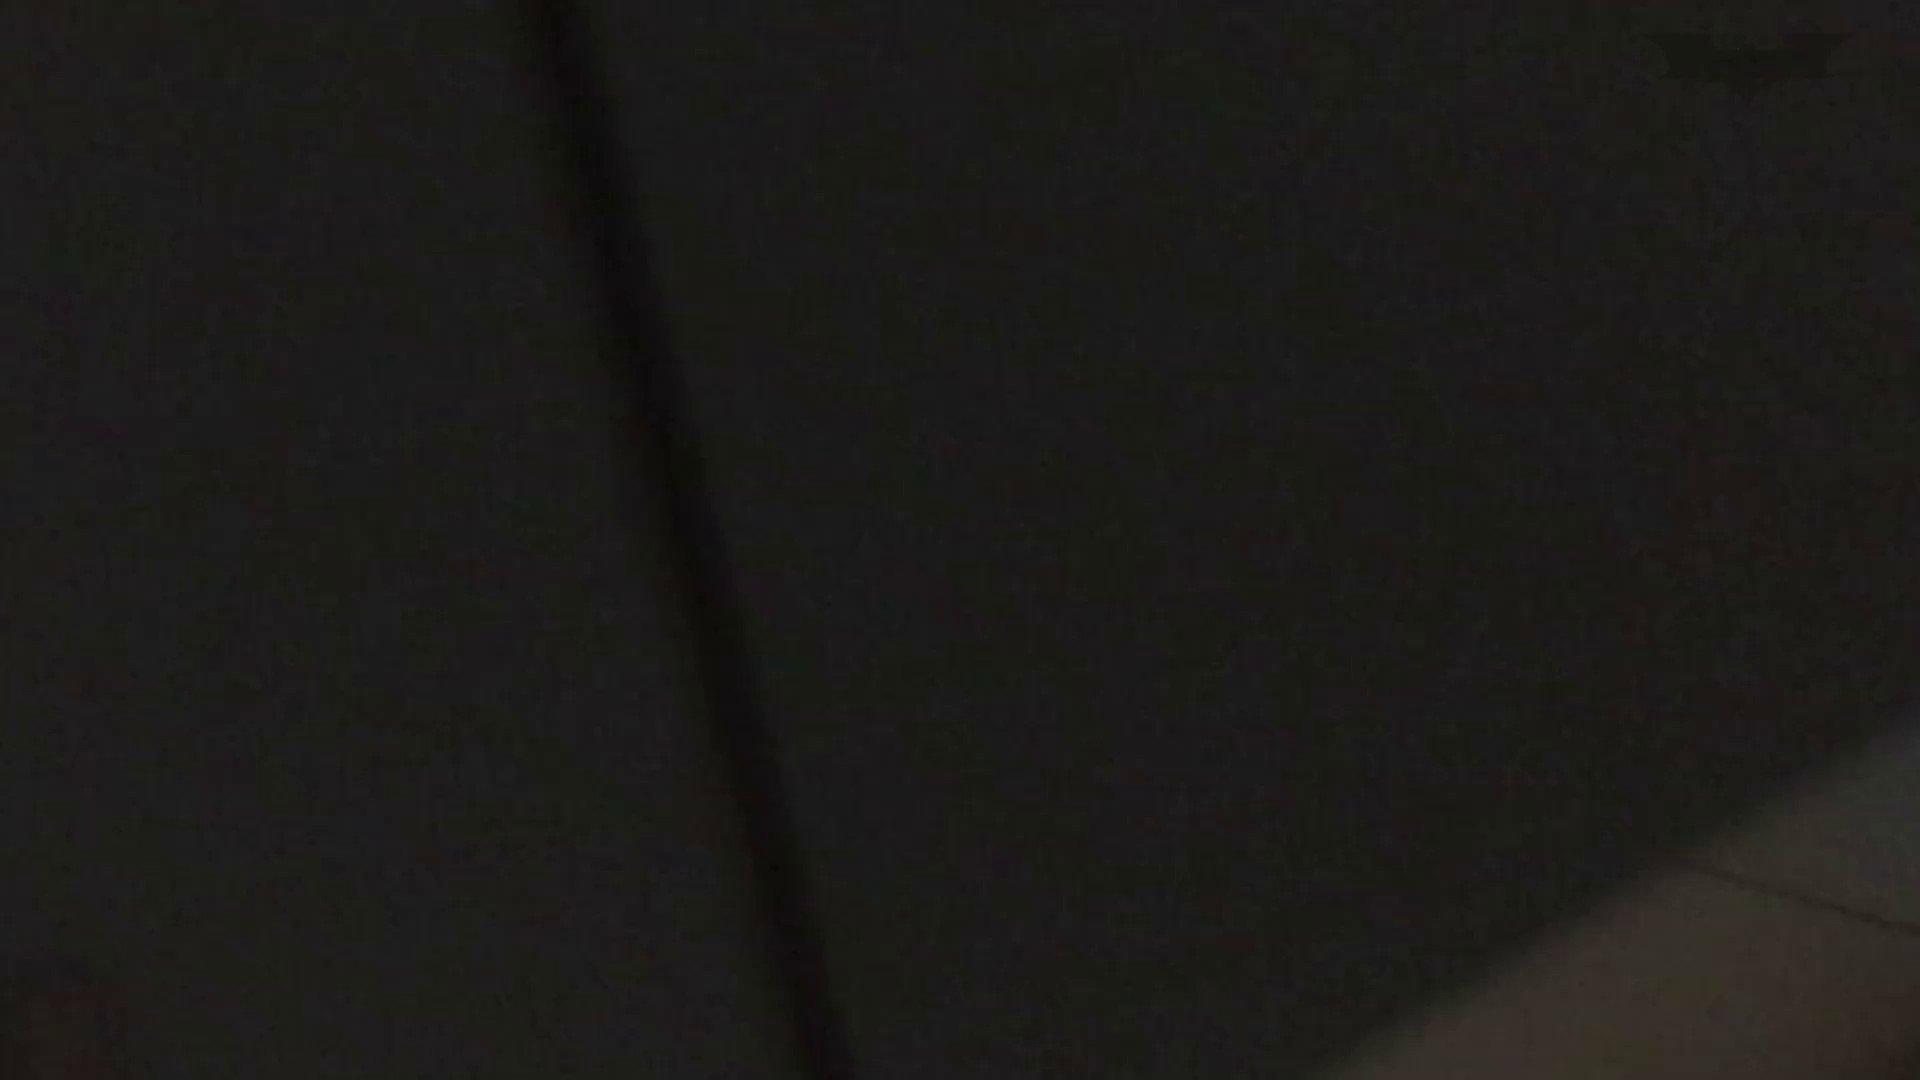 JD盗撮 美女の洗面所の秘密 Vol.69 トイレの実態 SEX無修正画像 86PIX 74